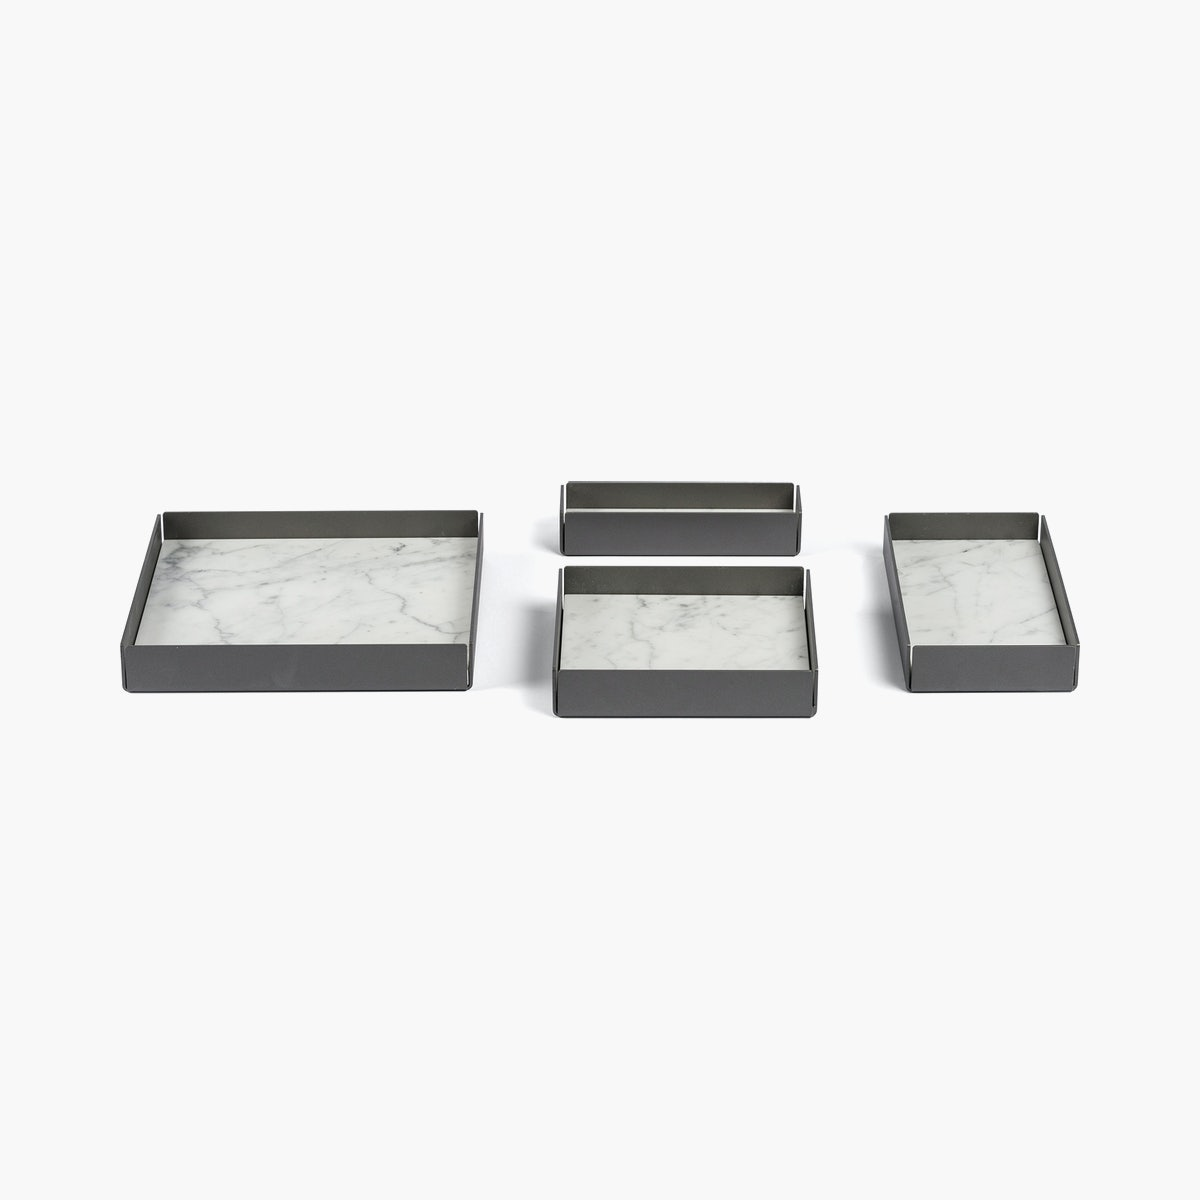 Fontane Bianche Modular Trays-Set of 4